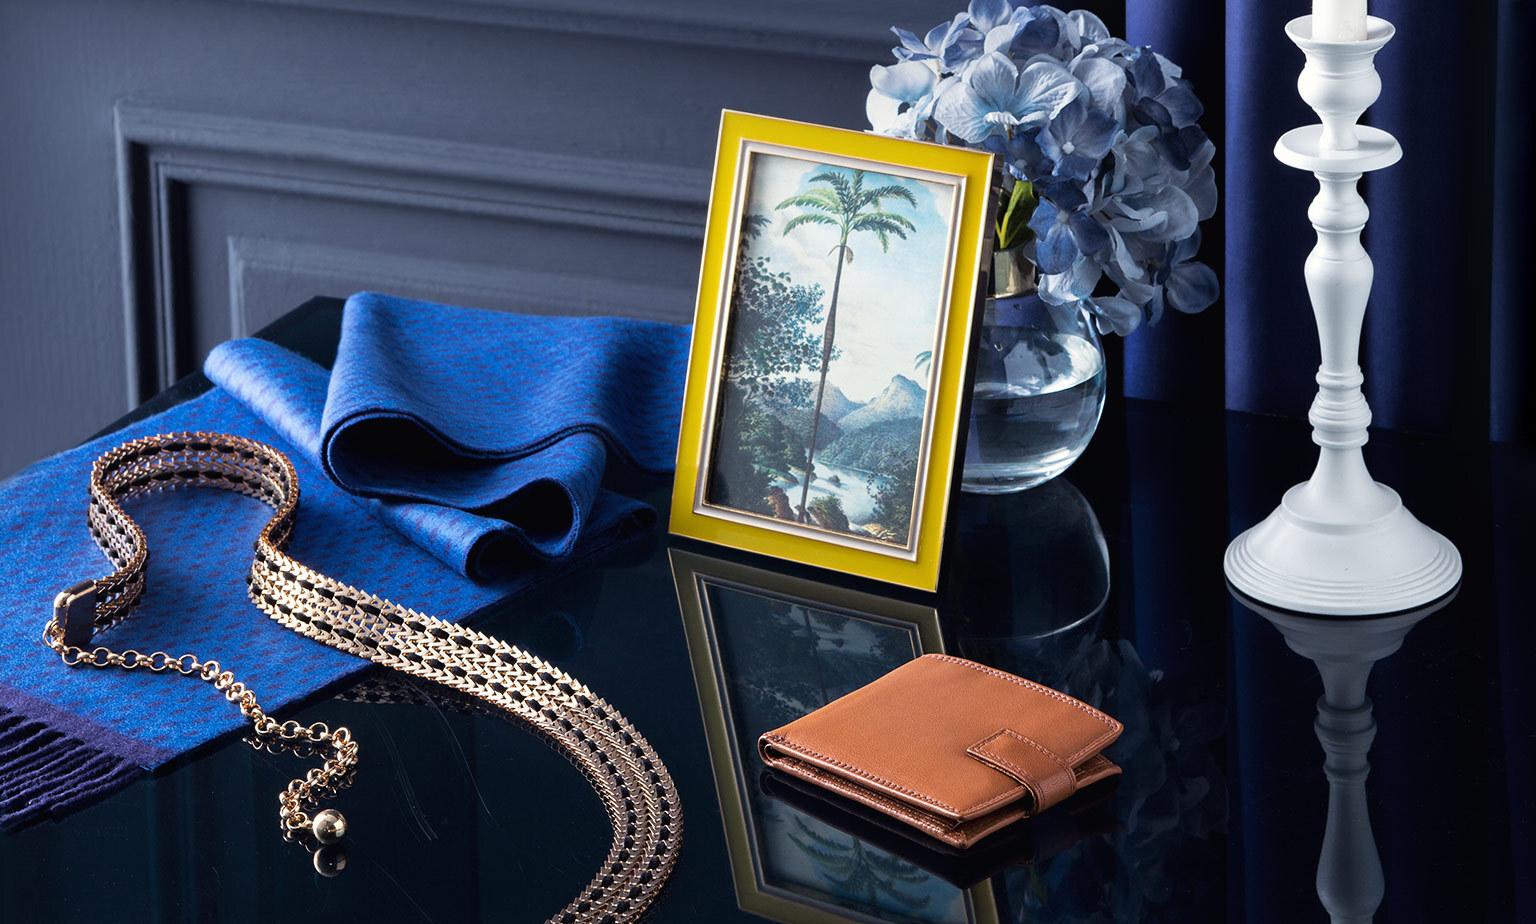 Designer-Accessoires aus 2. Hand - Jetzt shoppen